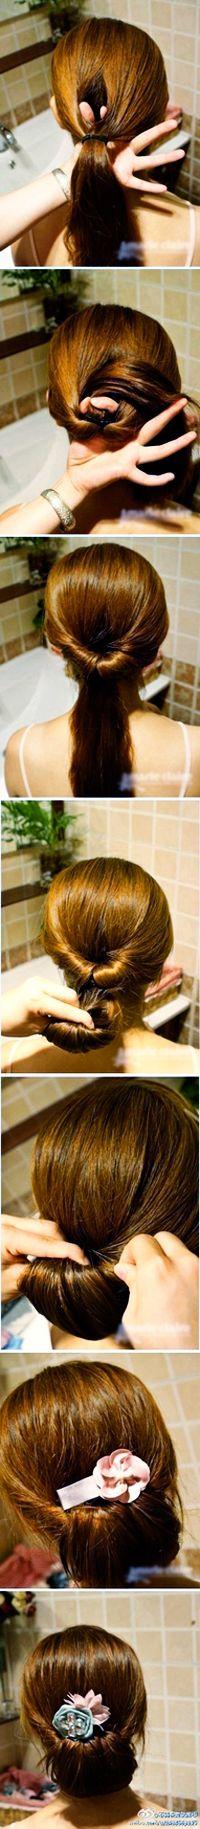 How to make a twisted side bun